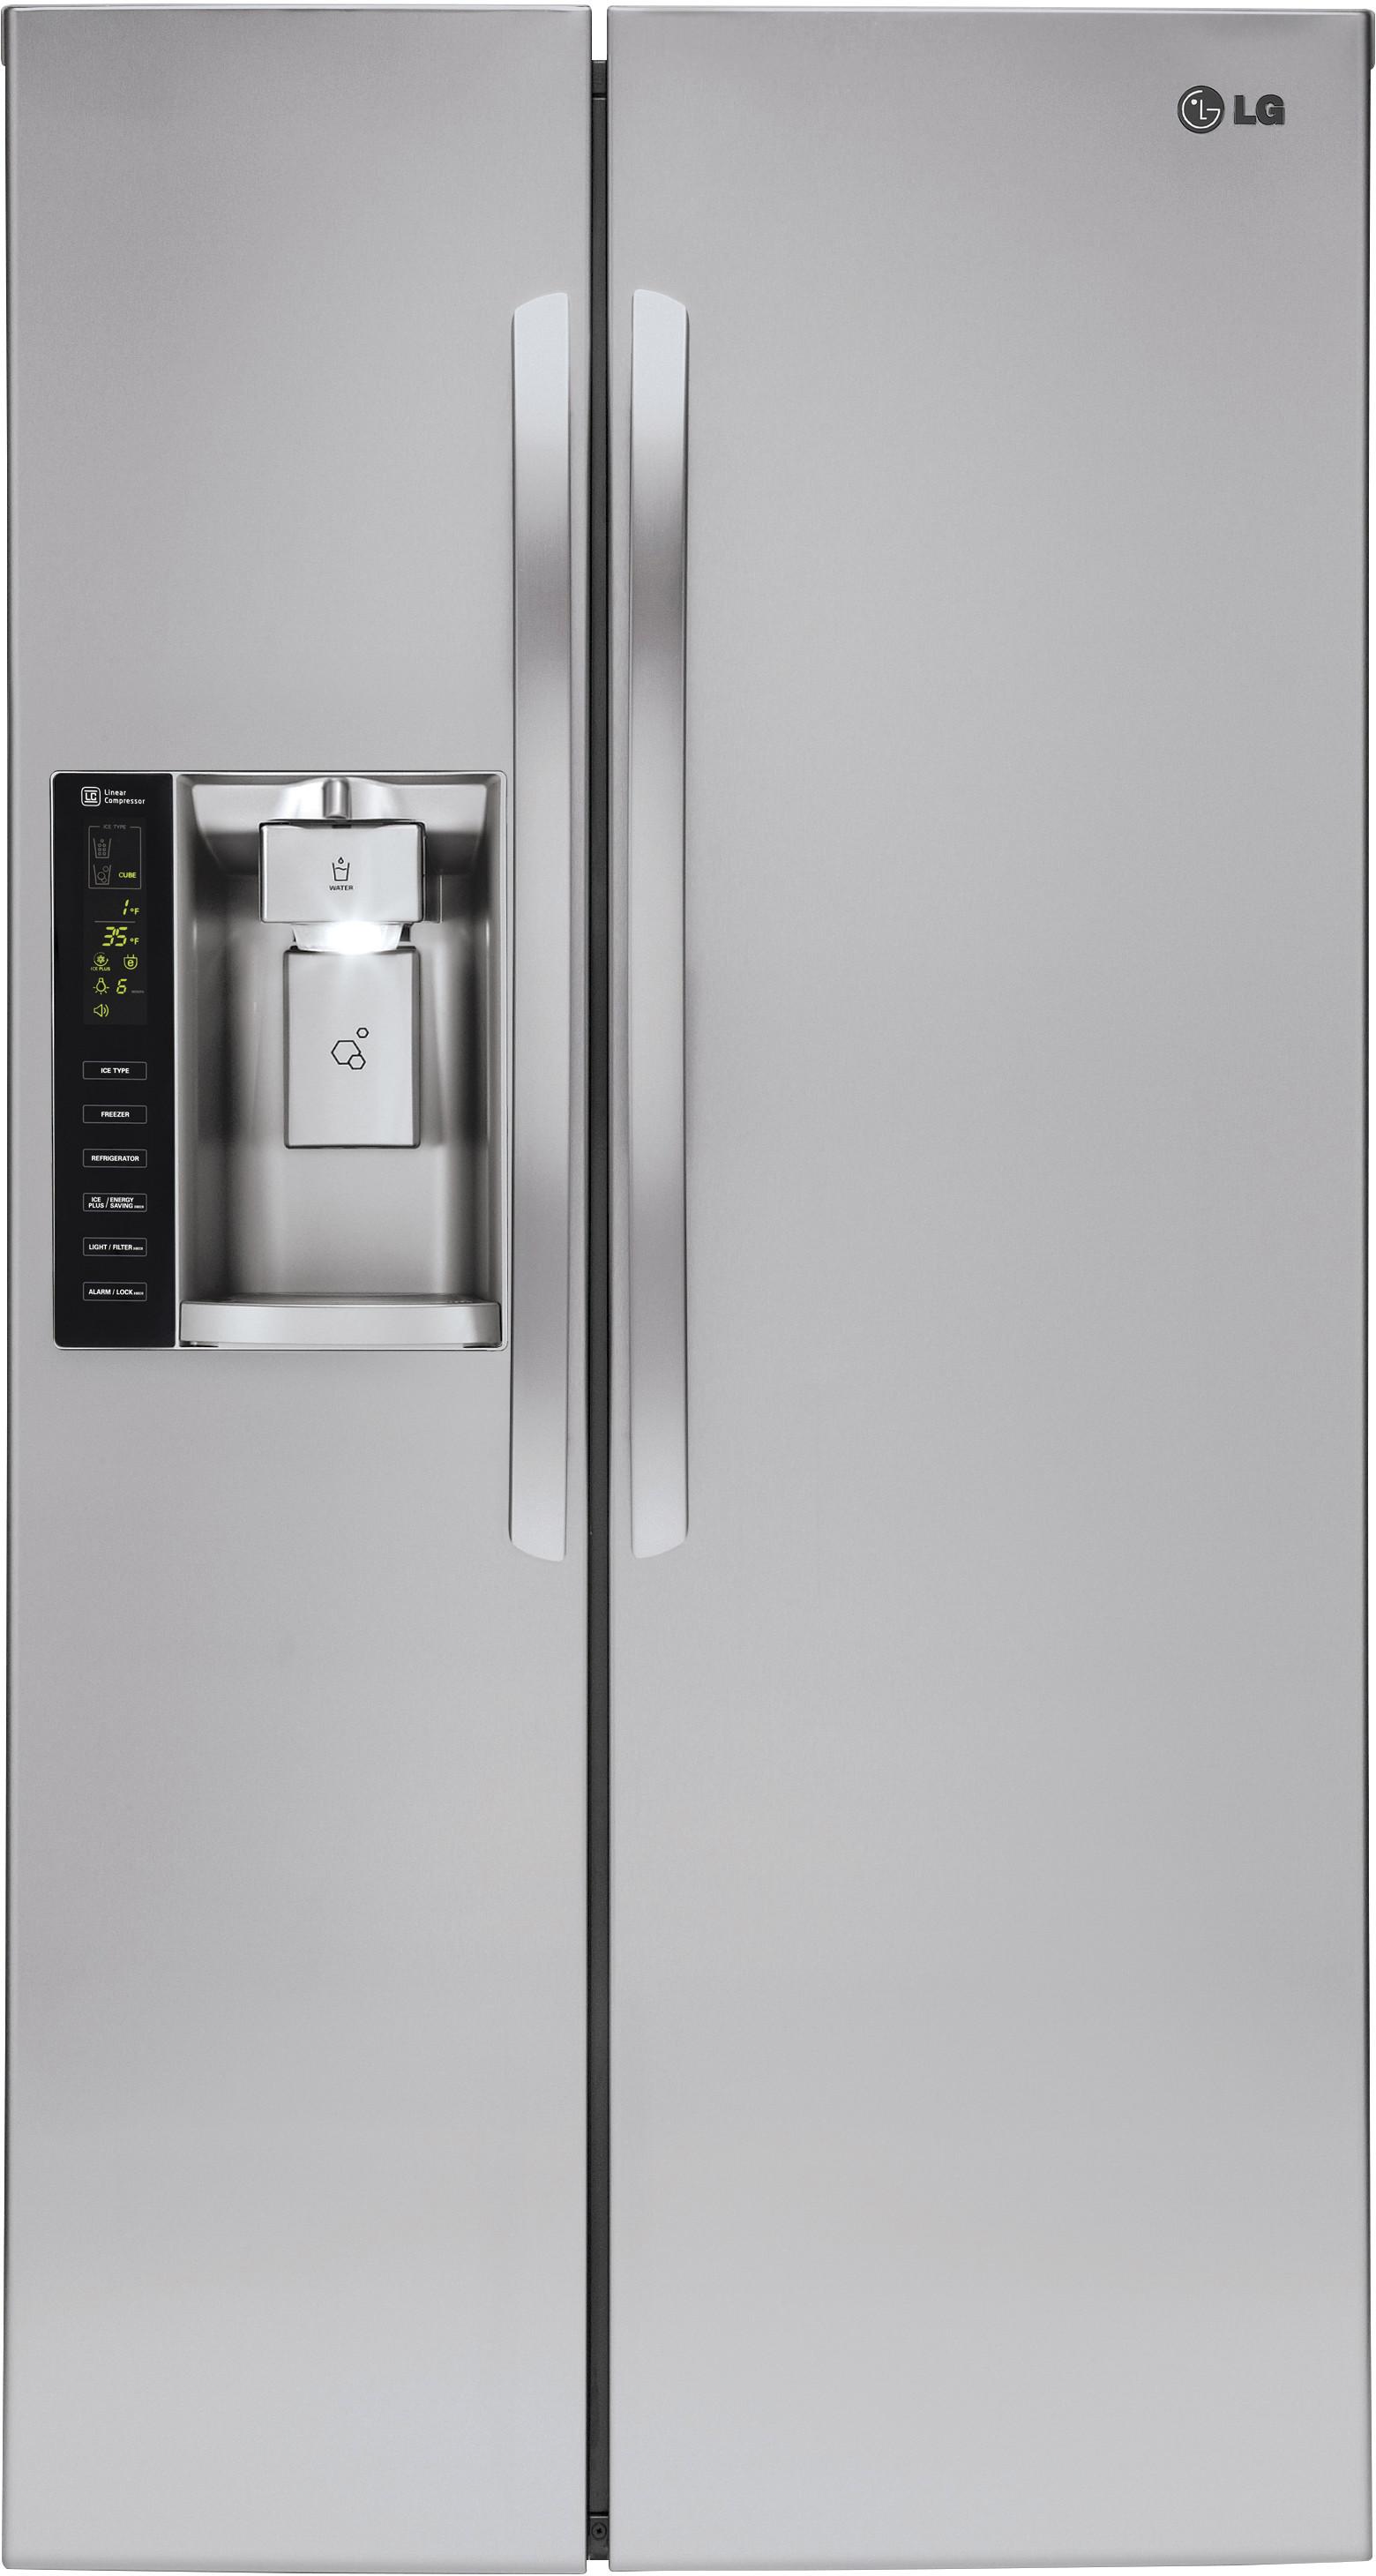 Side by side refrigerator 30 inch width - Side By Side Refrigerator 30 Inch Width 41